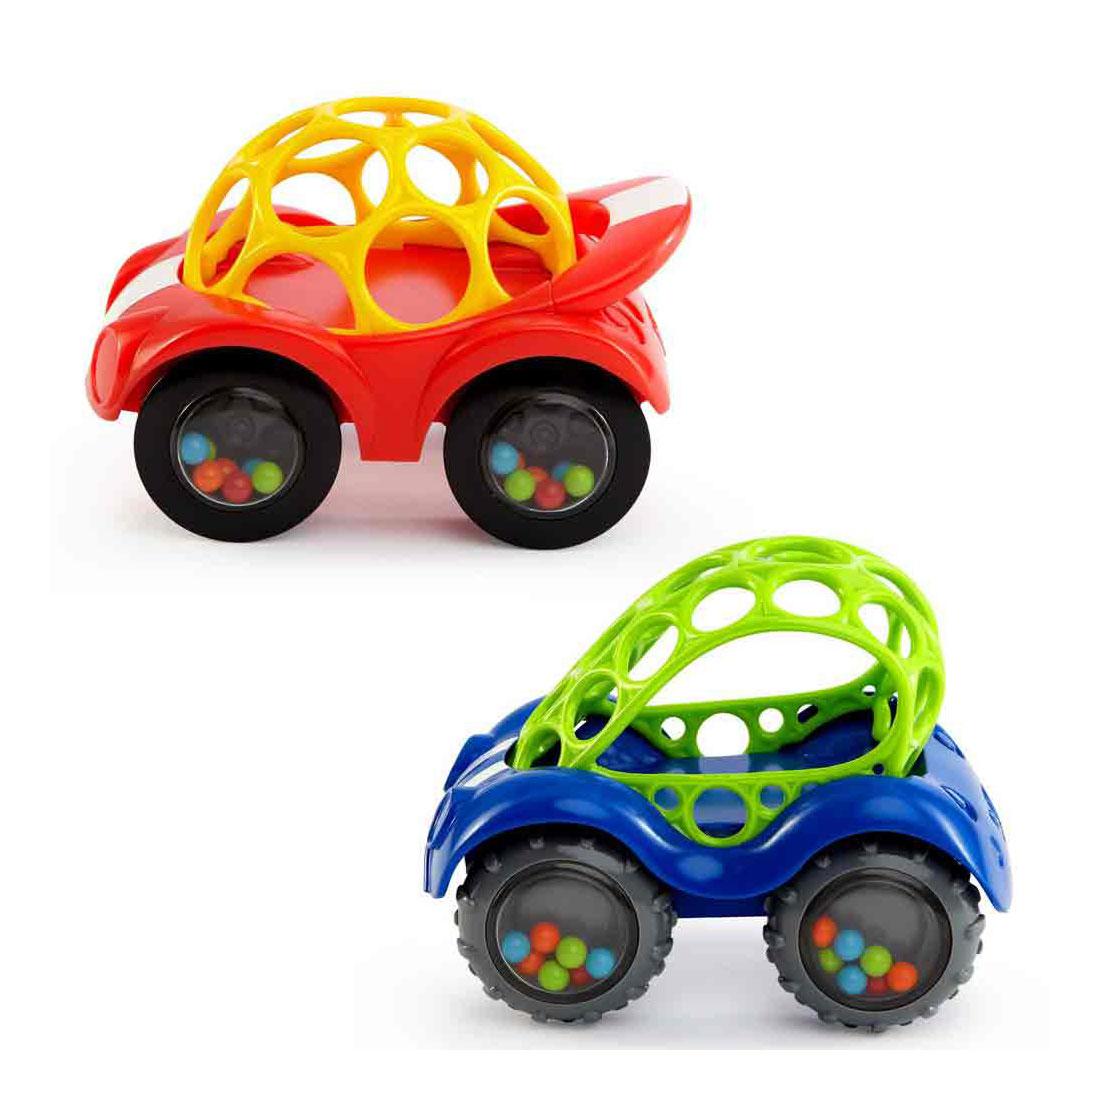 ����������� ������� Rhino Toys Oball ������� � ������������ � 0 ���.